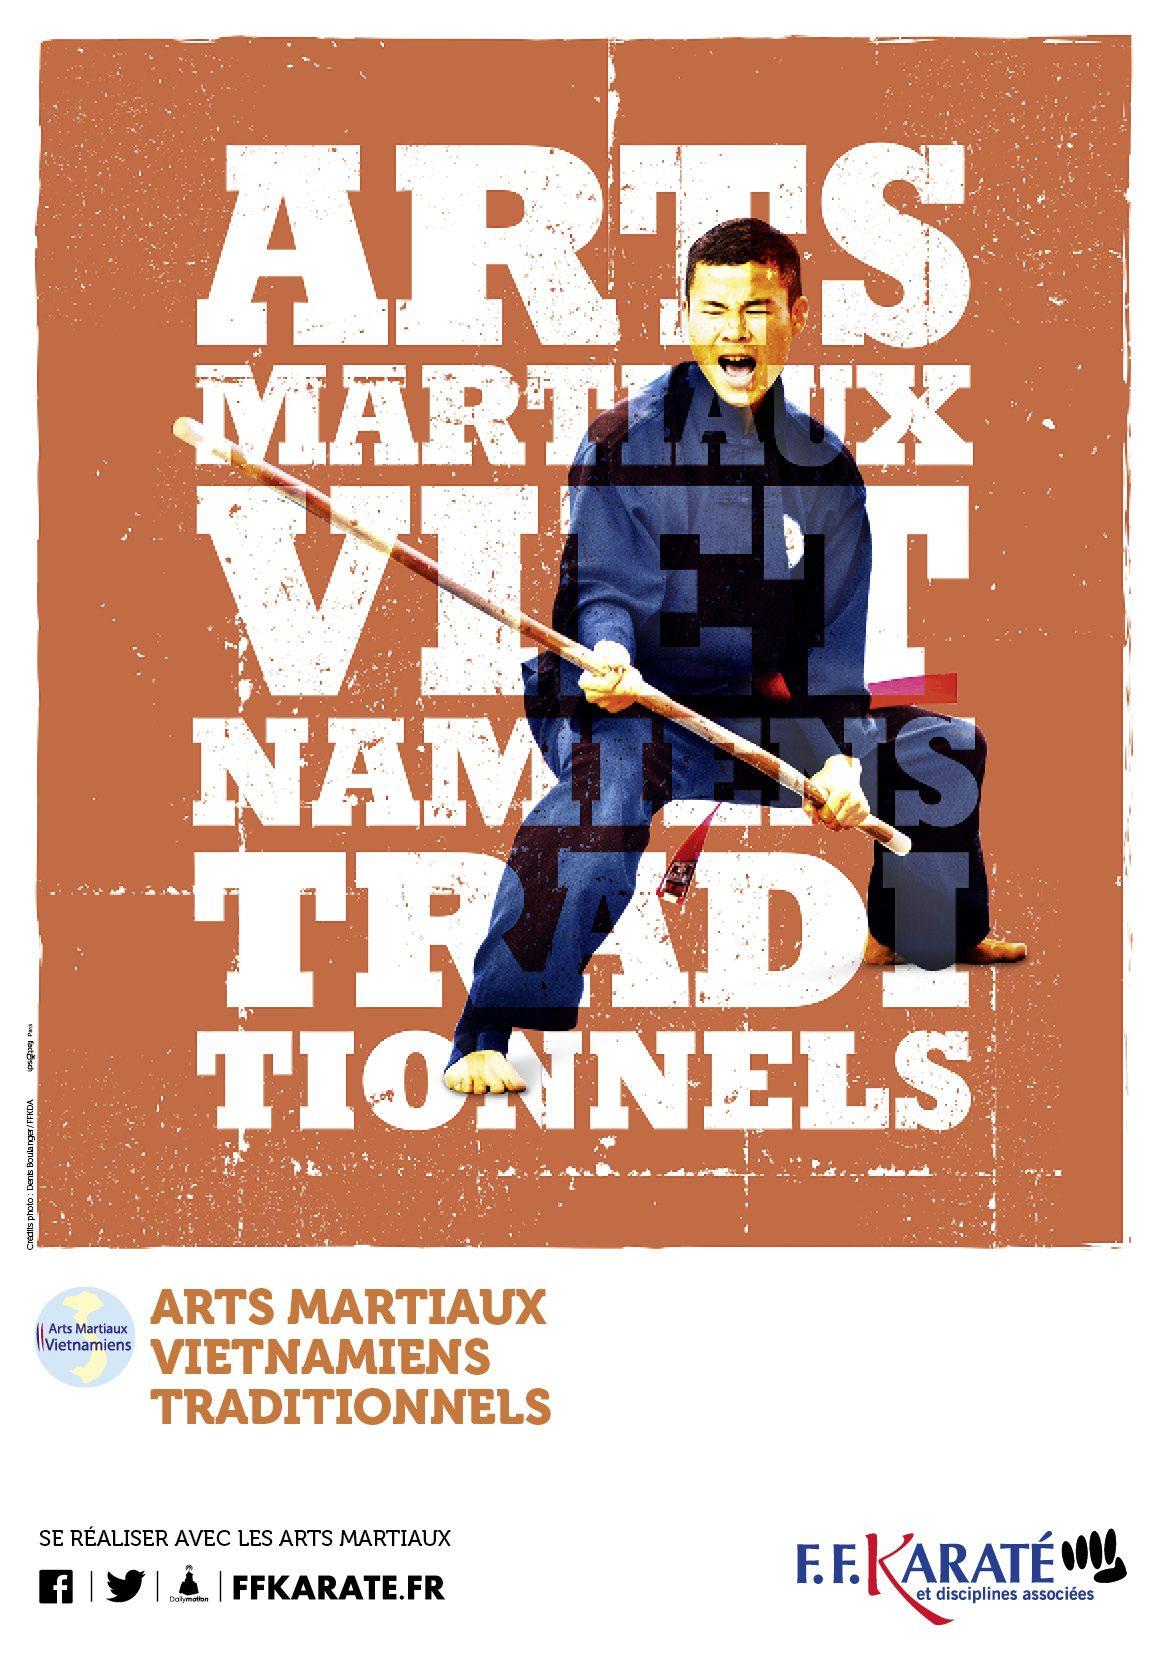 affiche arts martiaux vietnamiens campagne rentr e ffk karat sport design pinterest. Black Bedroom Furniture Sets. Home Design Ideas